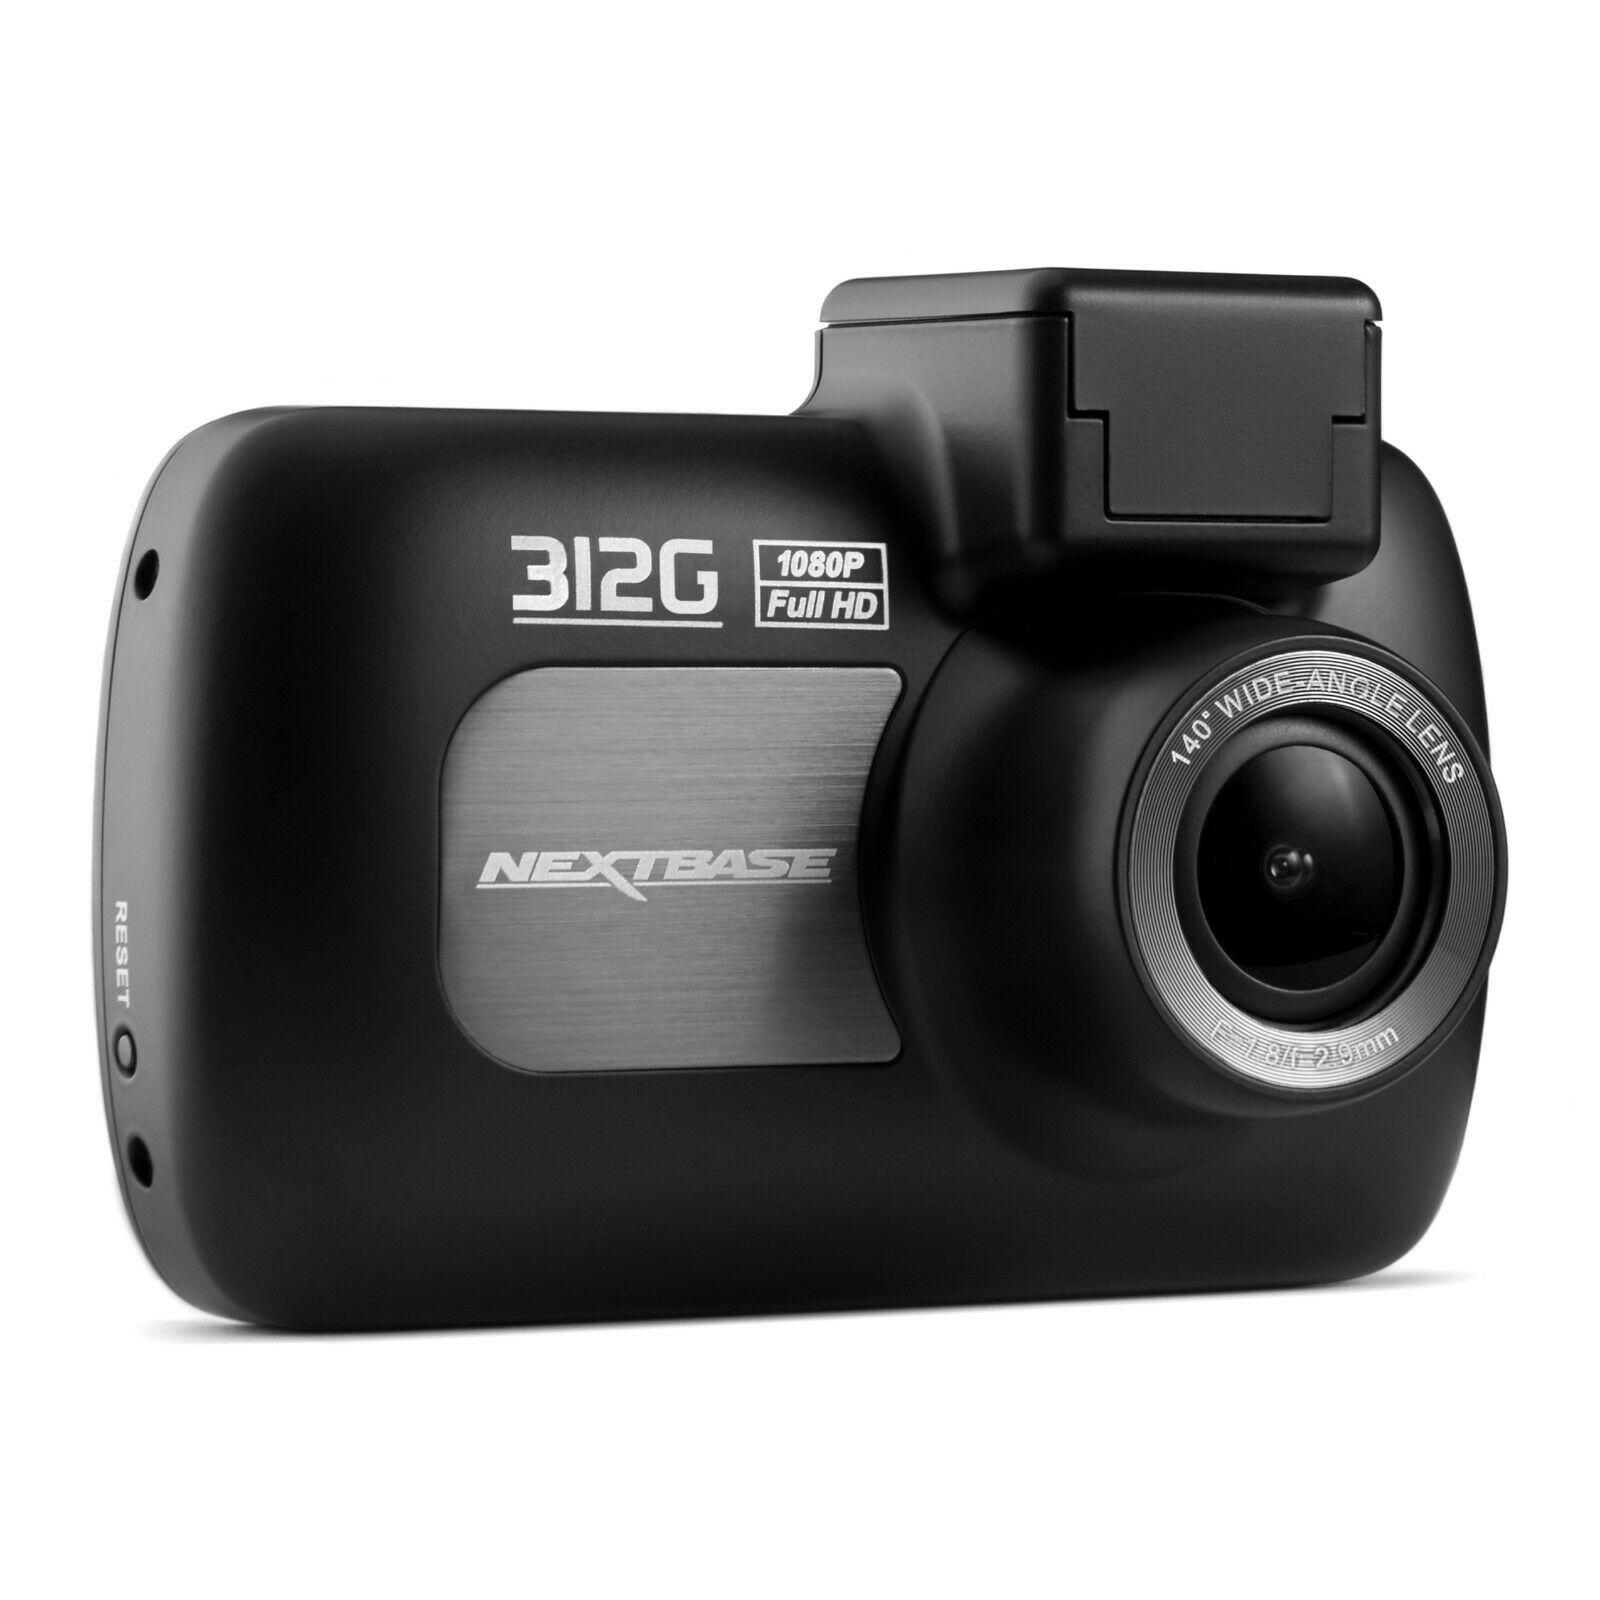 Nextbase 312G Dash Cam 1080P - £49.95 ebay  velocityelectronics